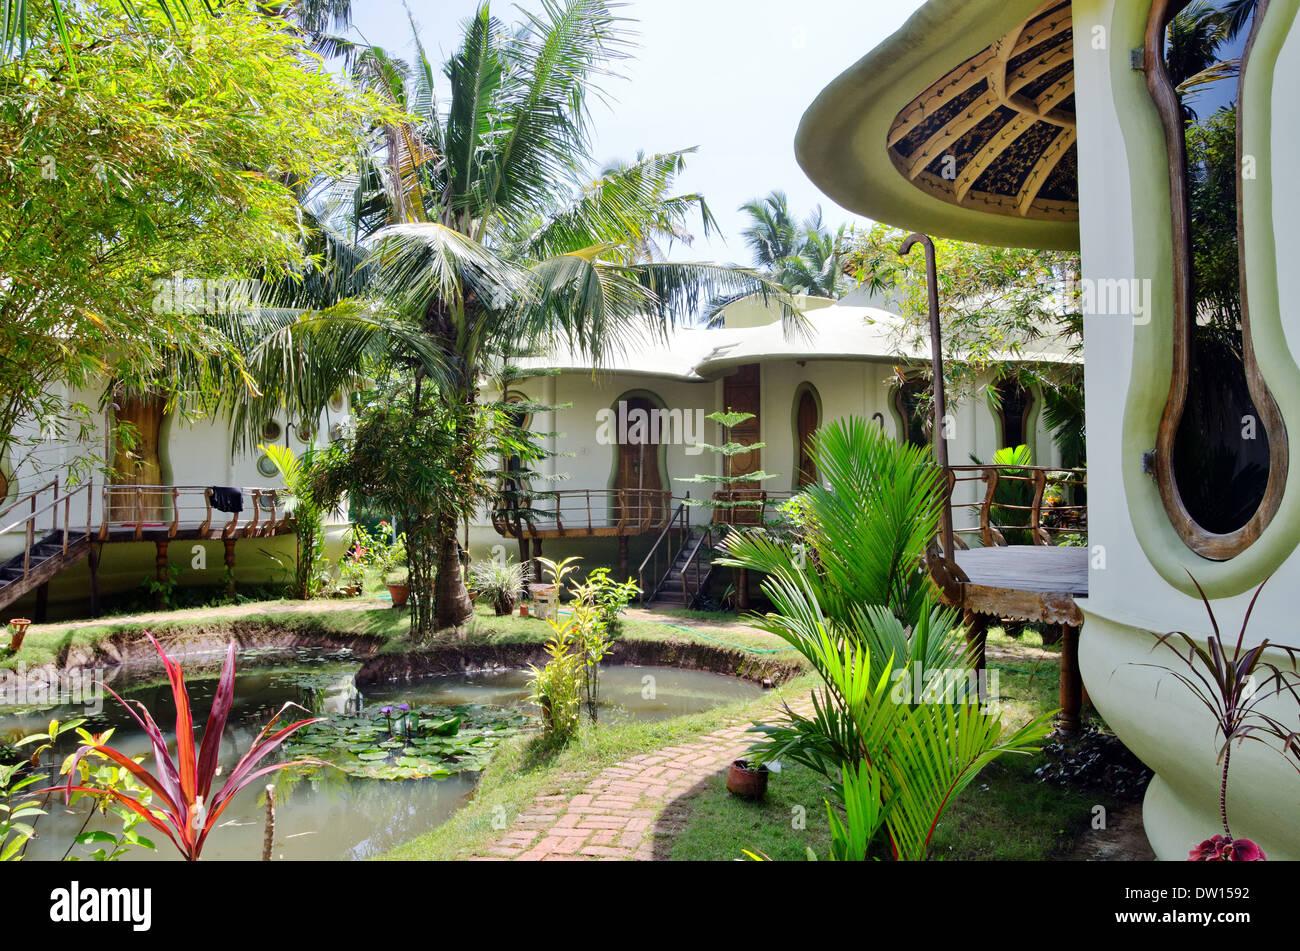 Eden garden a tourist resort in varkala kerala india for Garden house in india